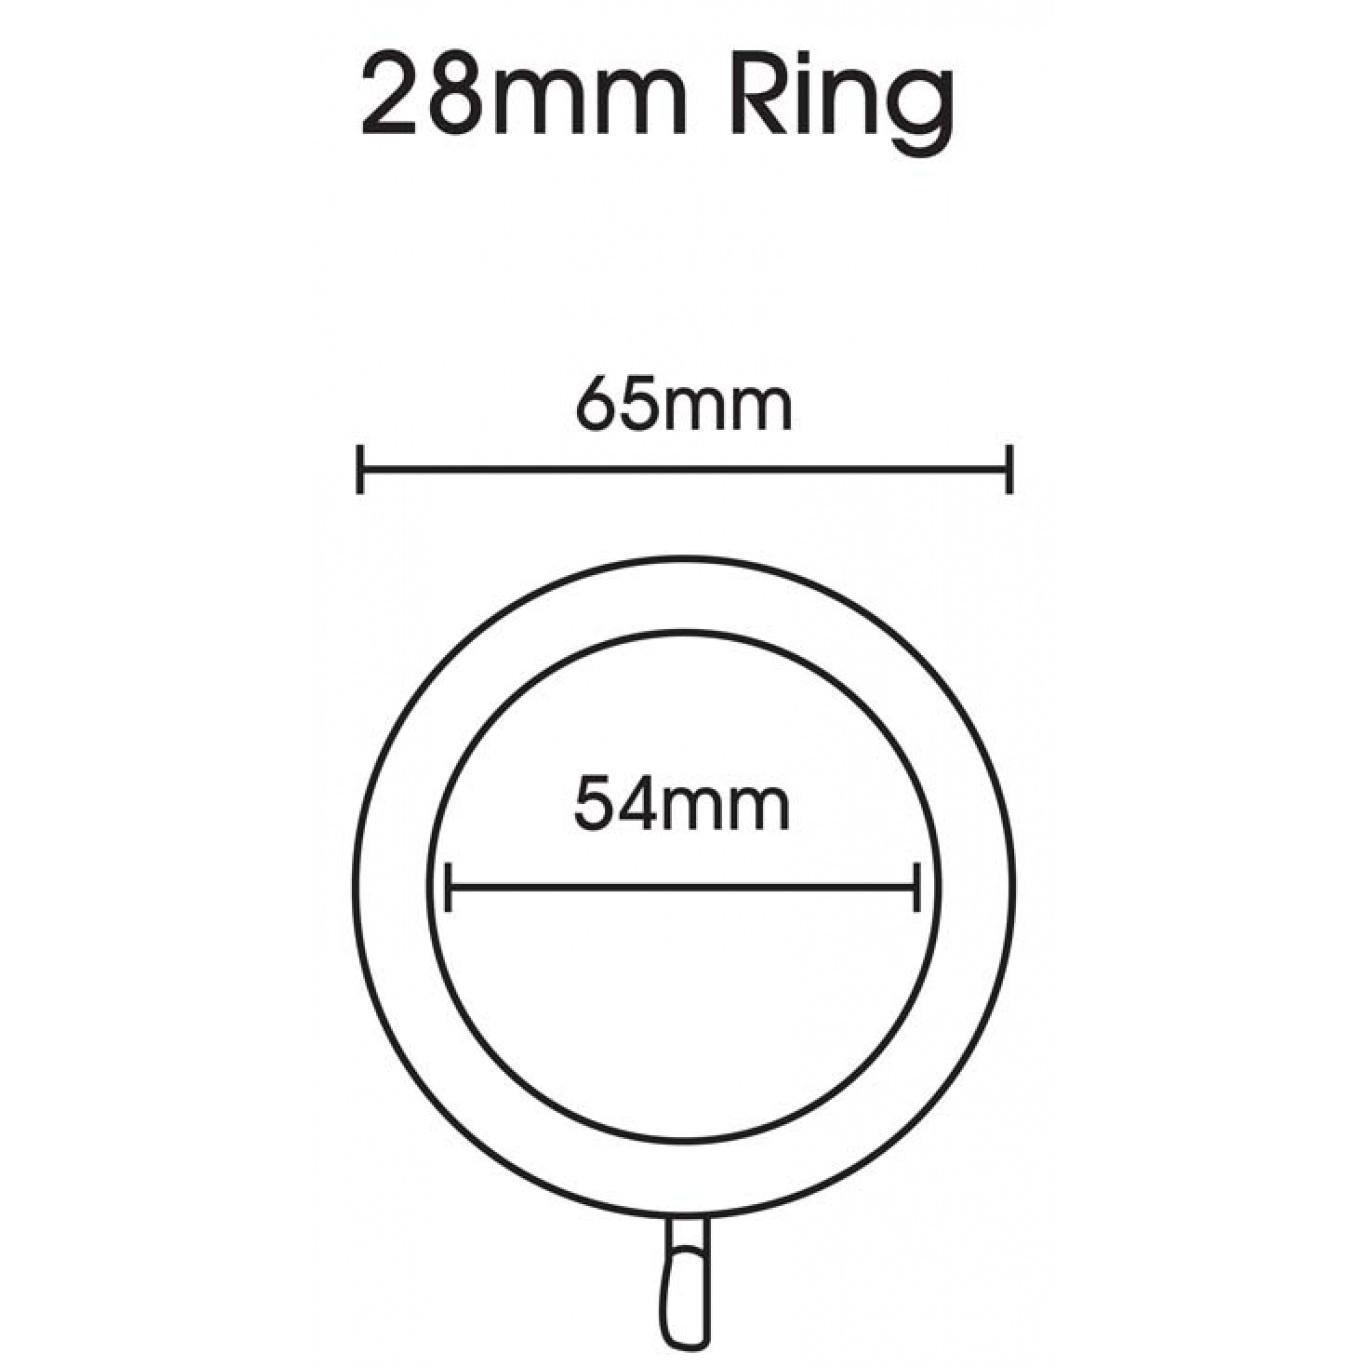 Swish Elements 28mm Satin Steel Rings Pack of 4